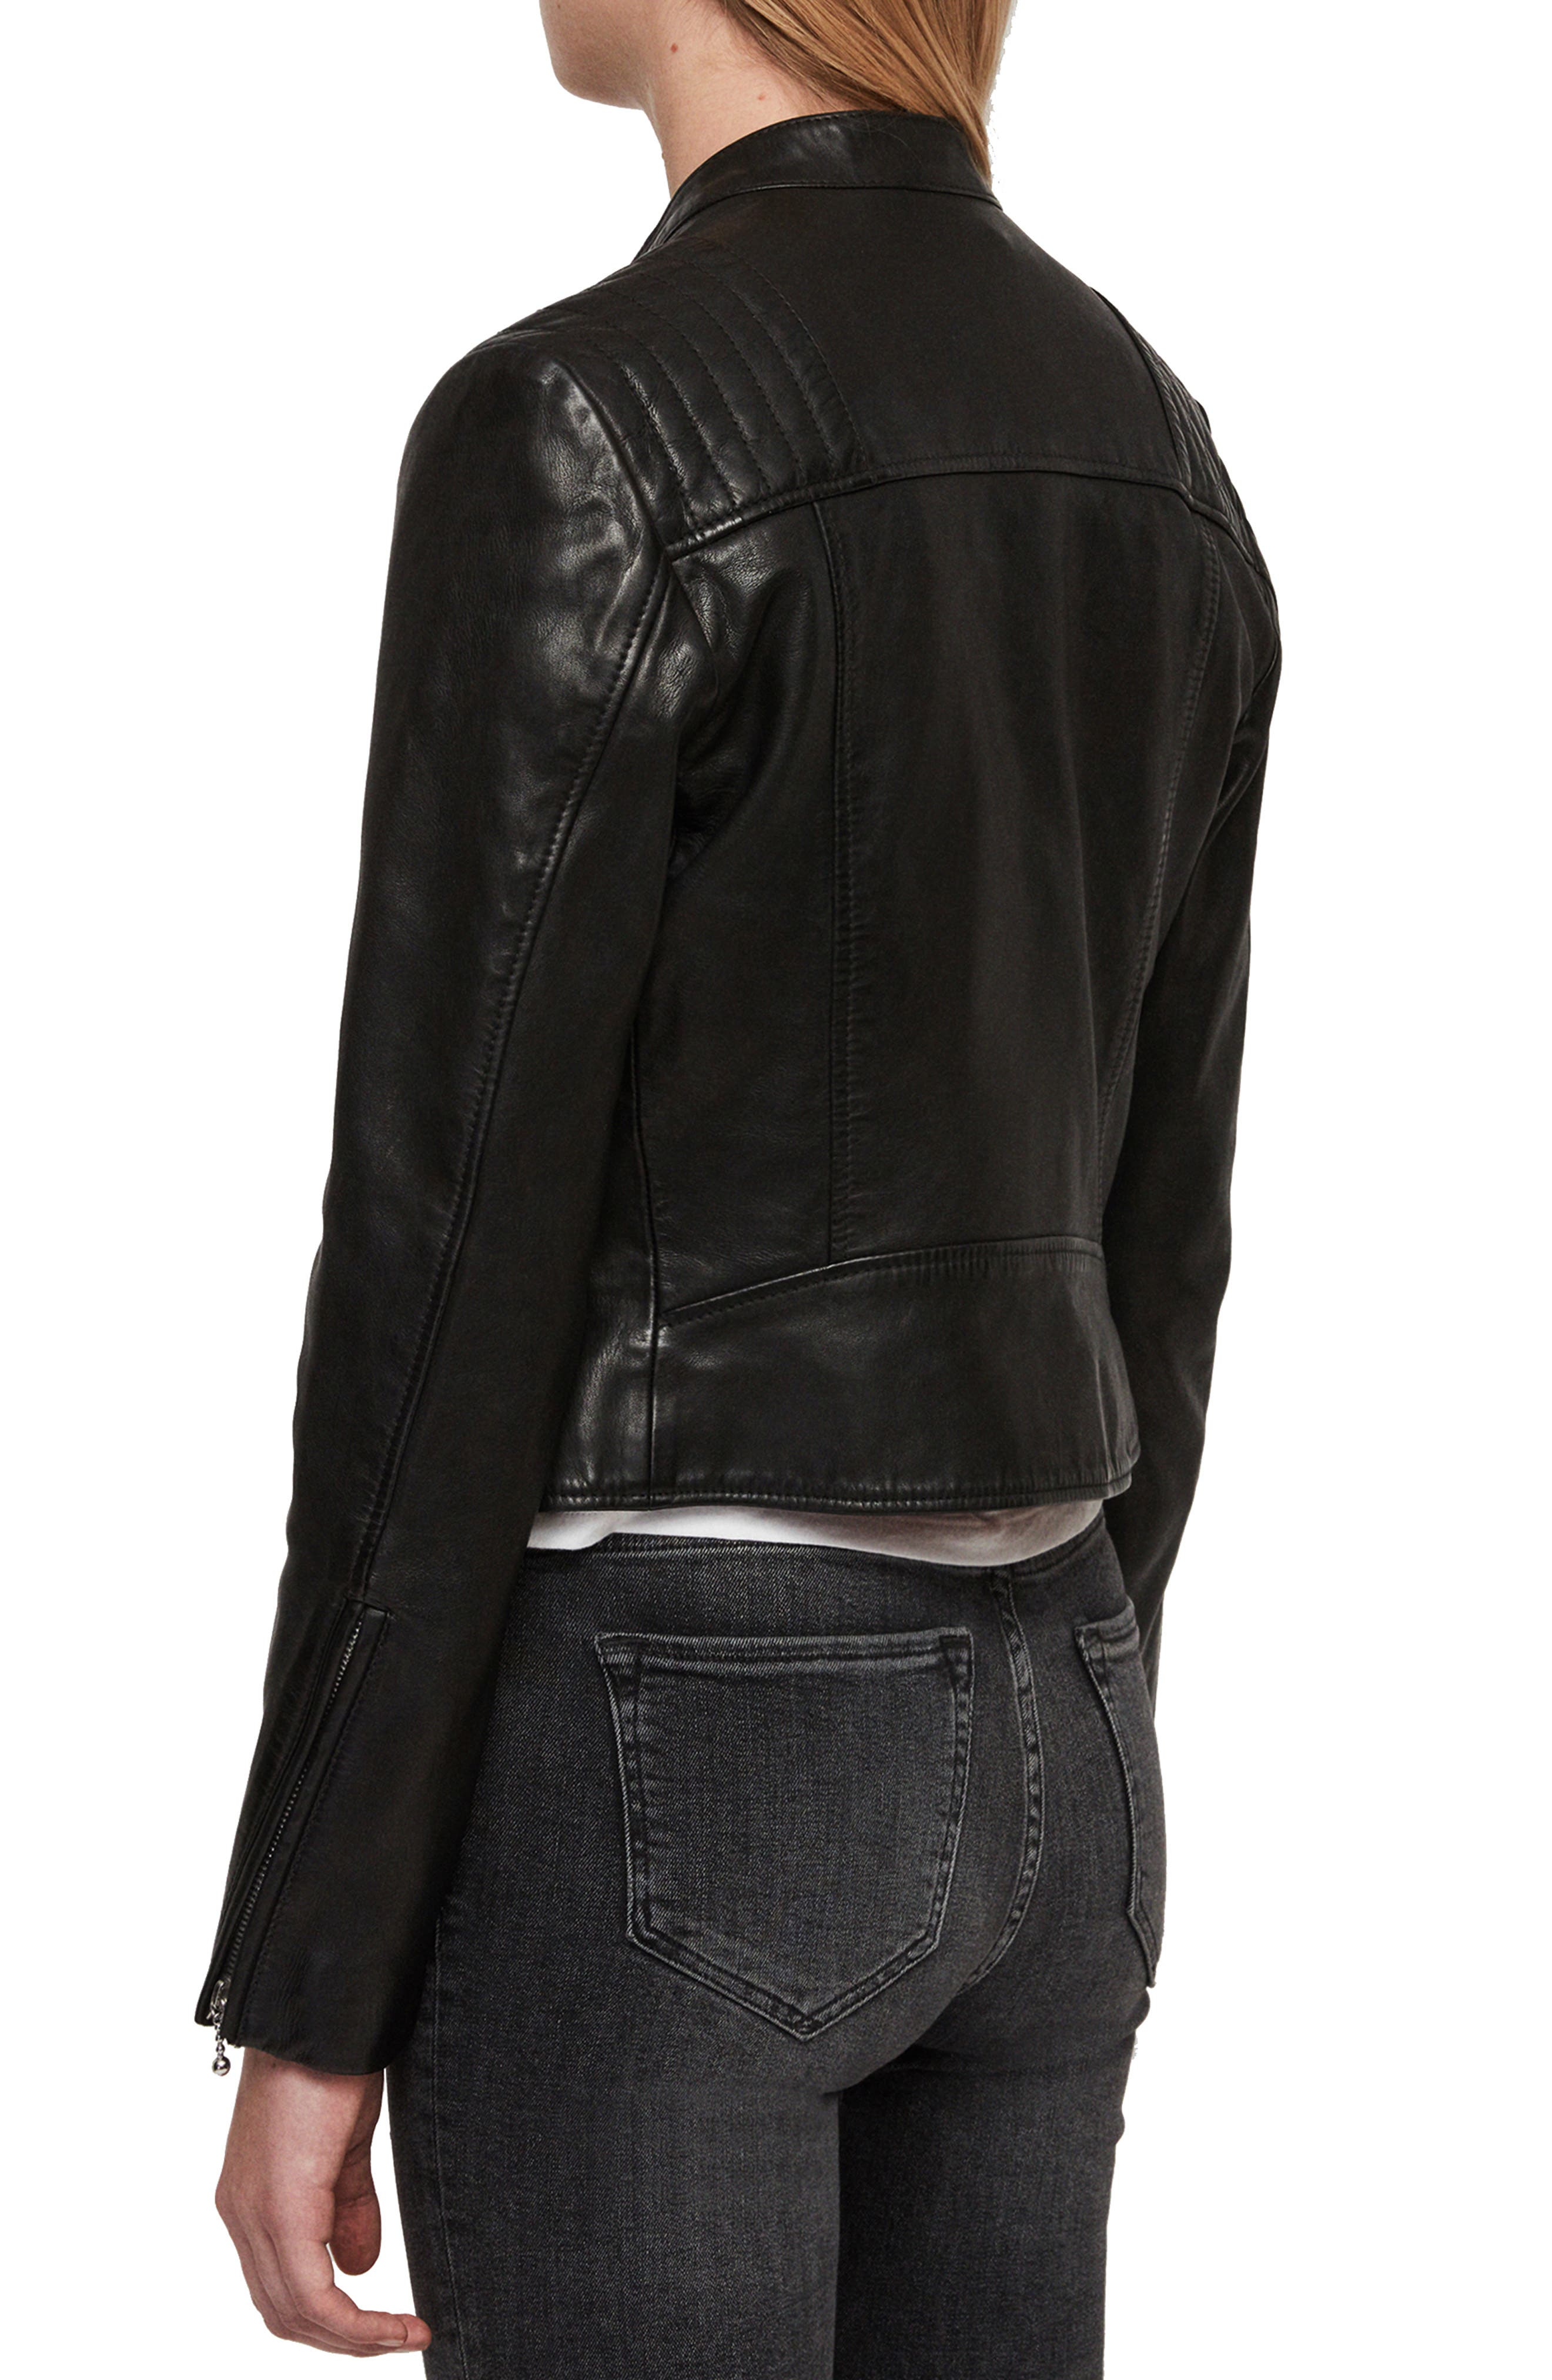 ALLSAINTS, Bircham Leather Biker Jacket, Alternate thumbnail 2, color, BLACK